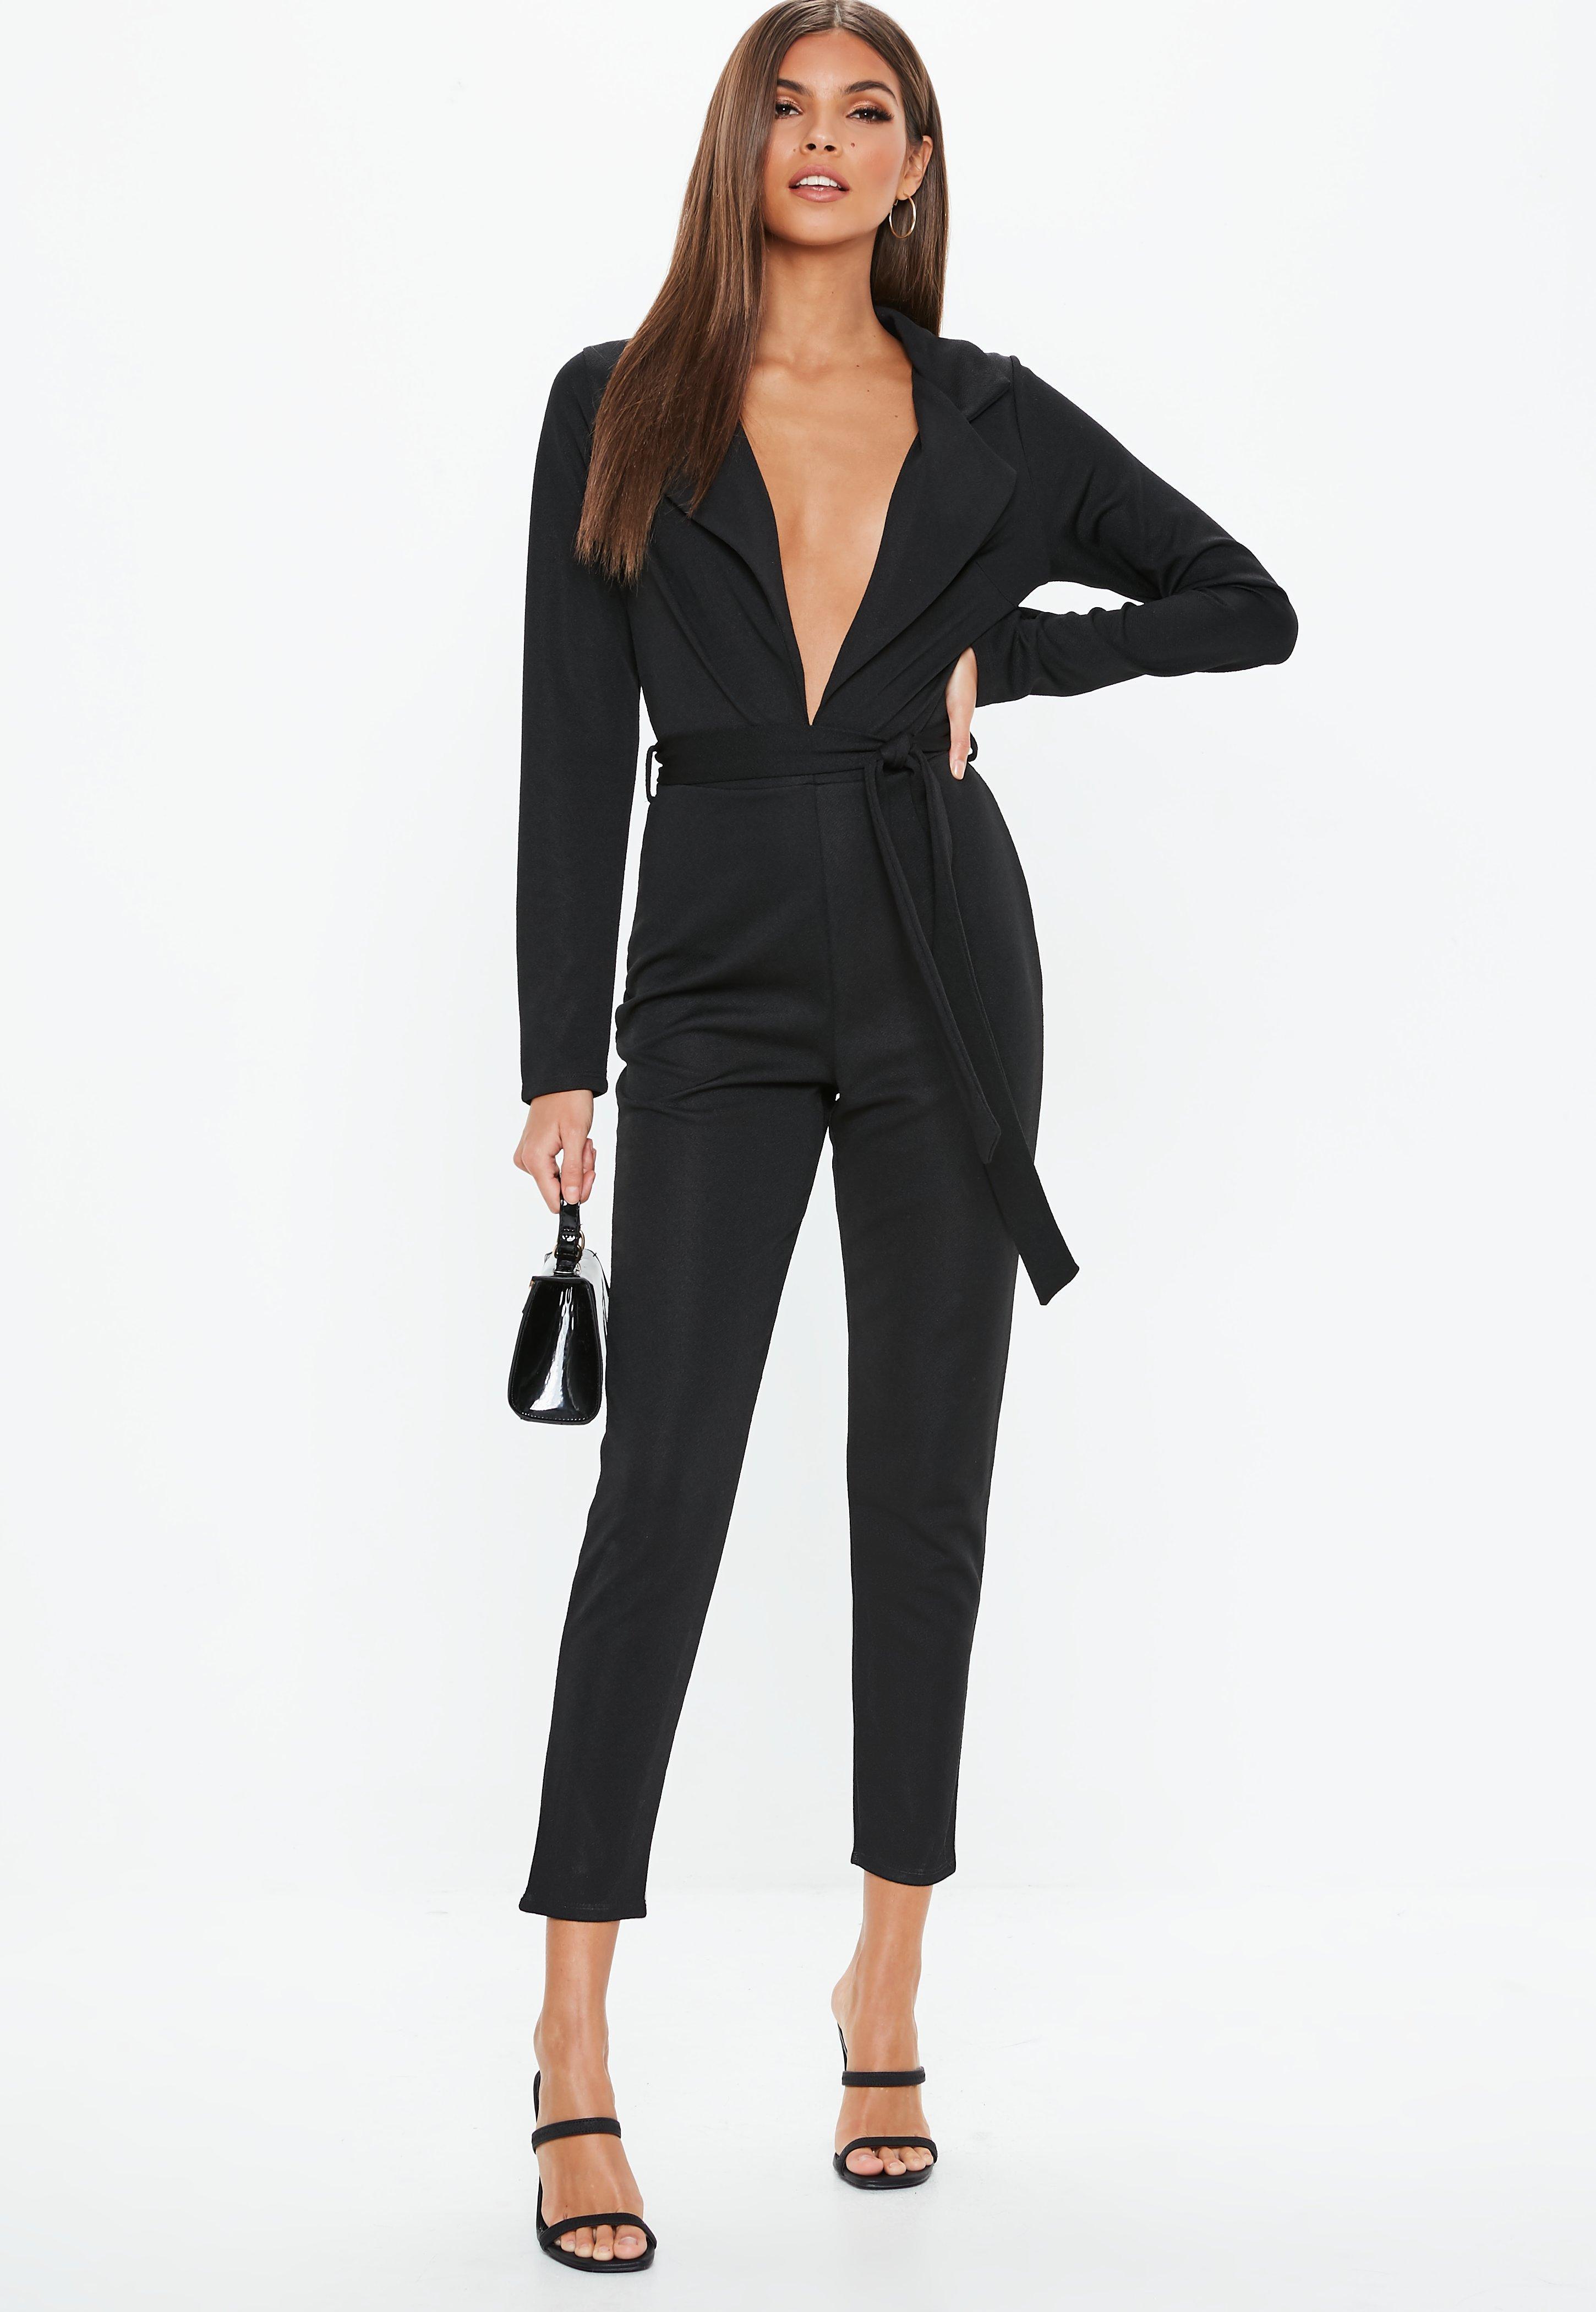 Dressy Black Pantsuits